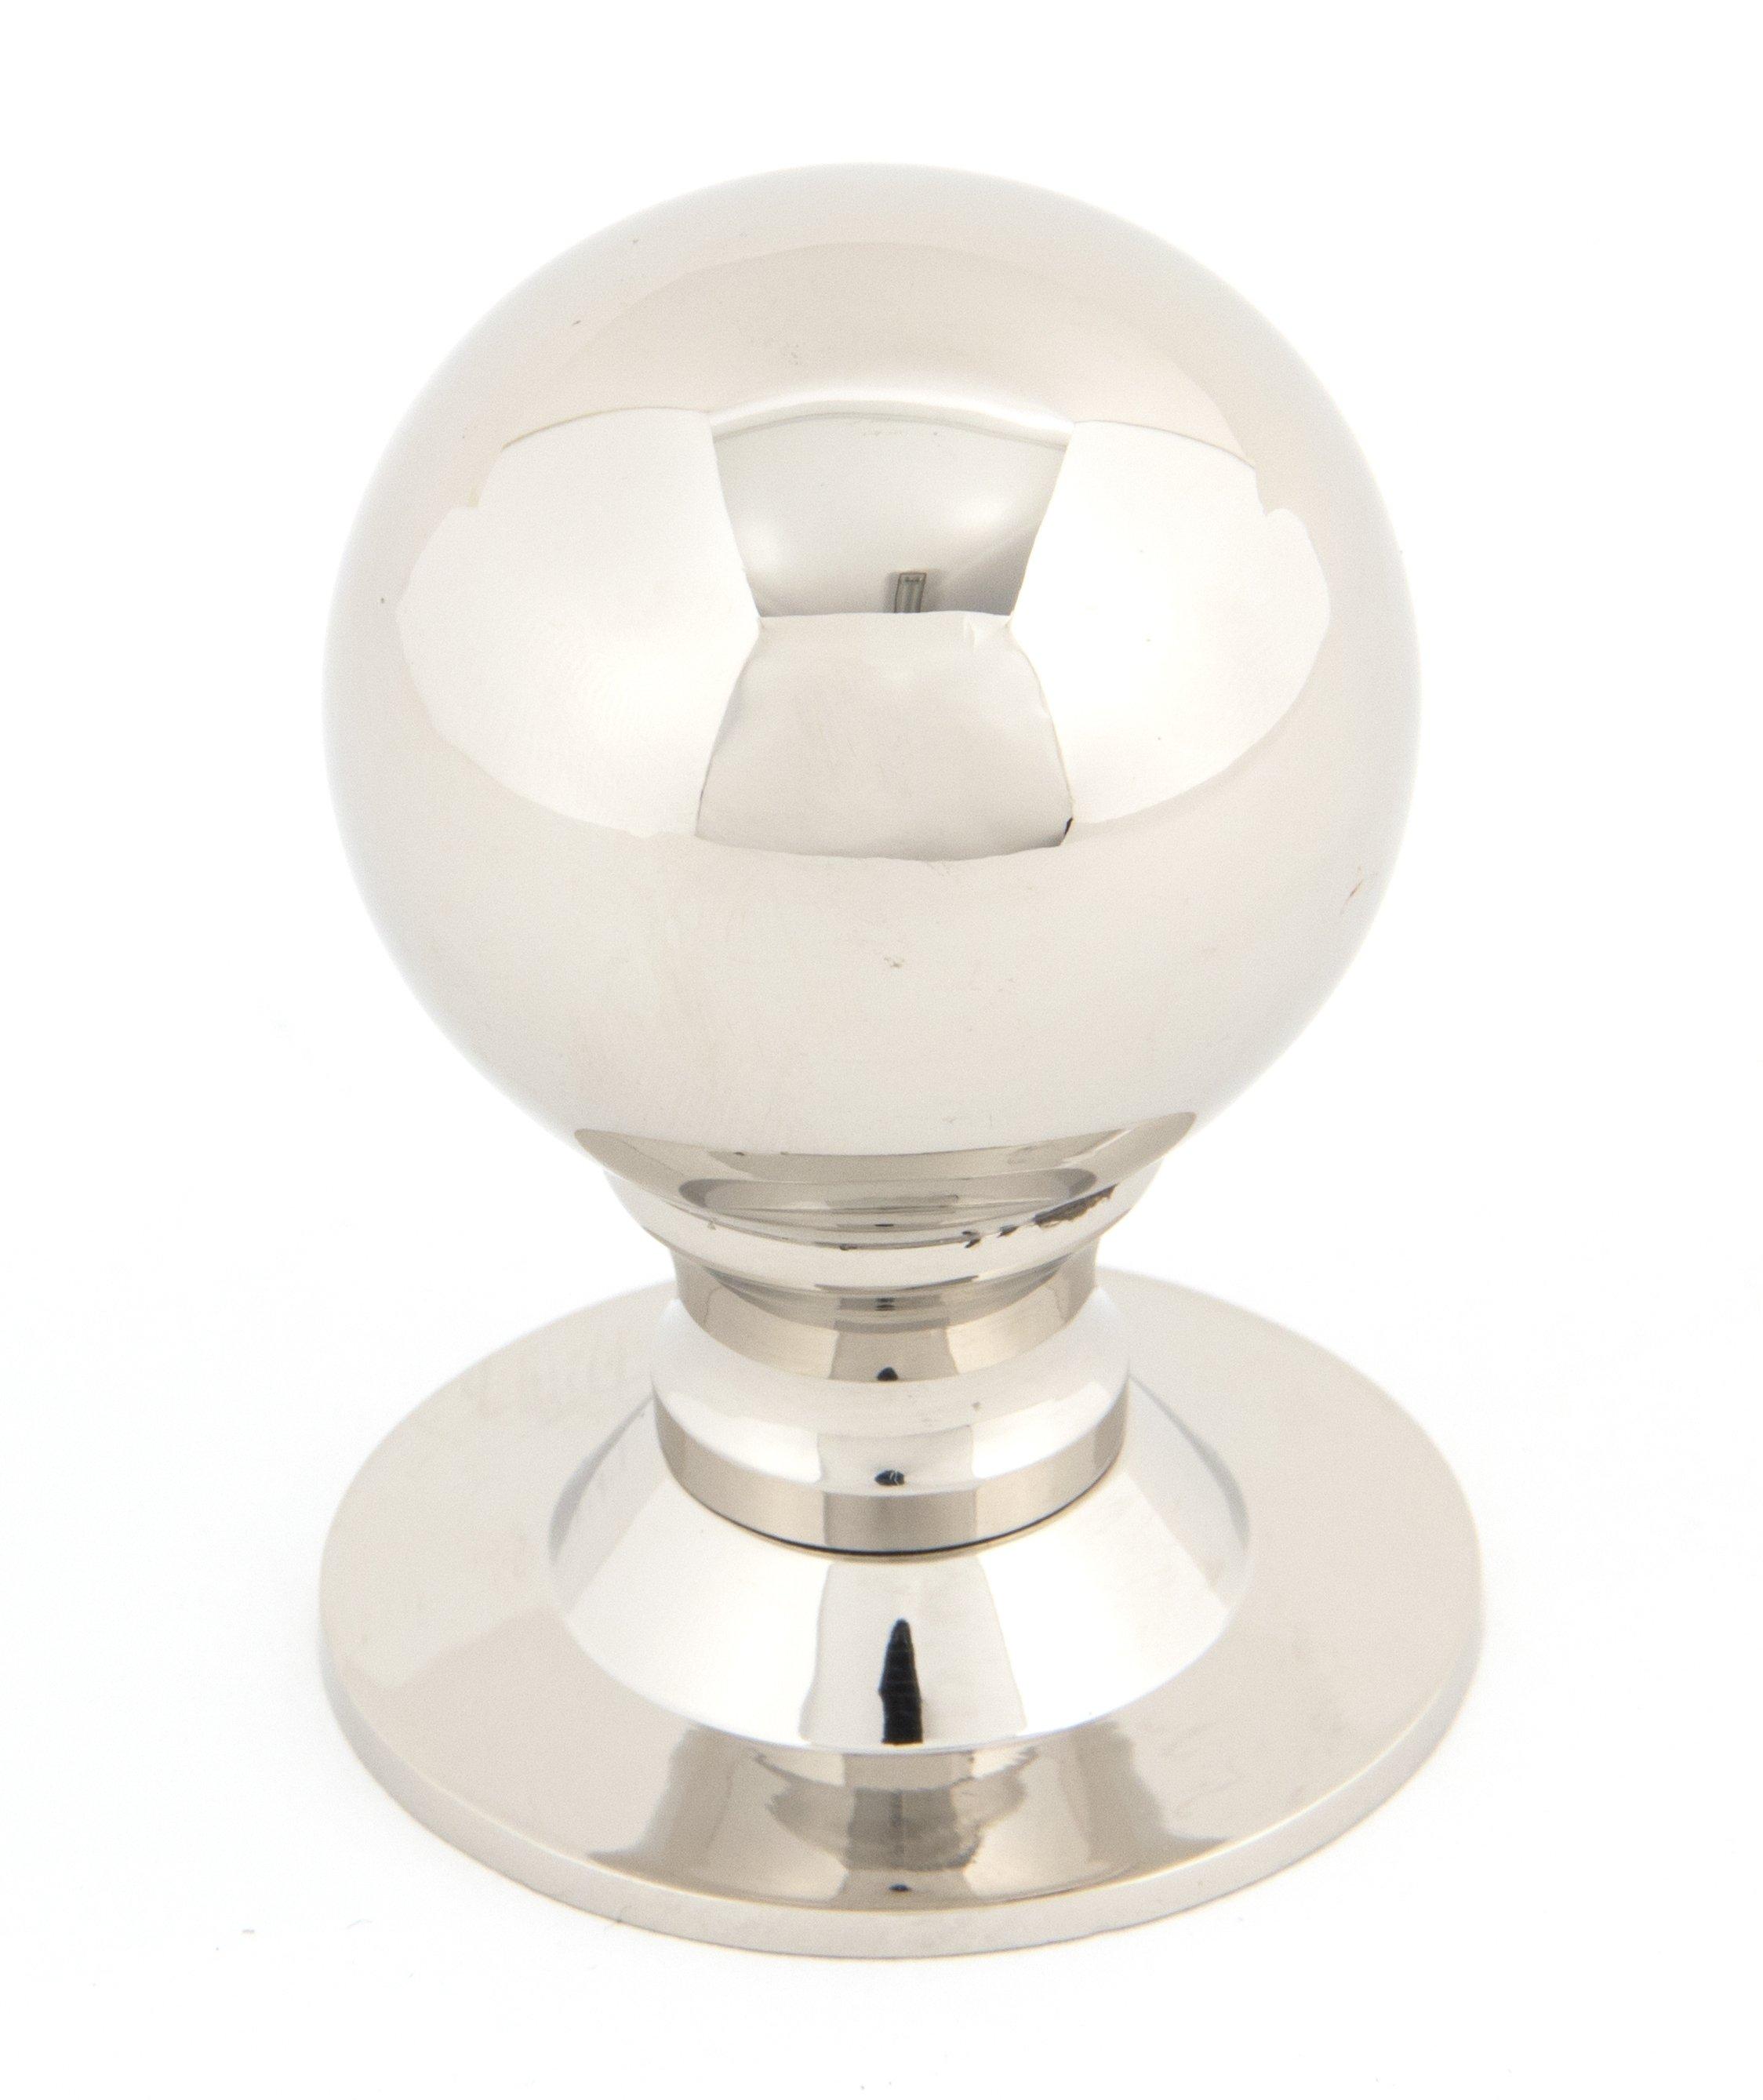 Polished Nickel Ball Cabinet Knob - Large